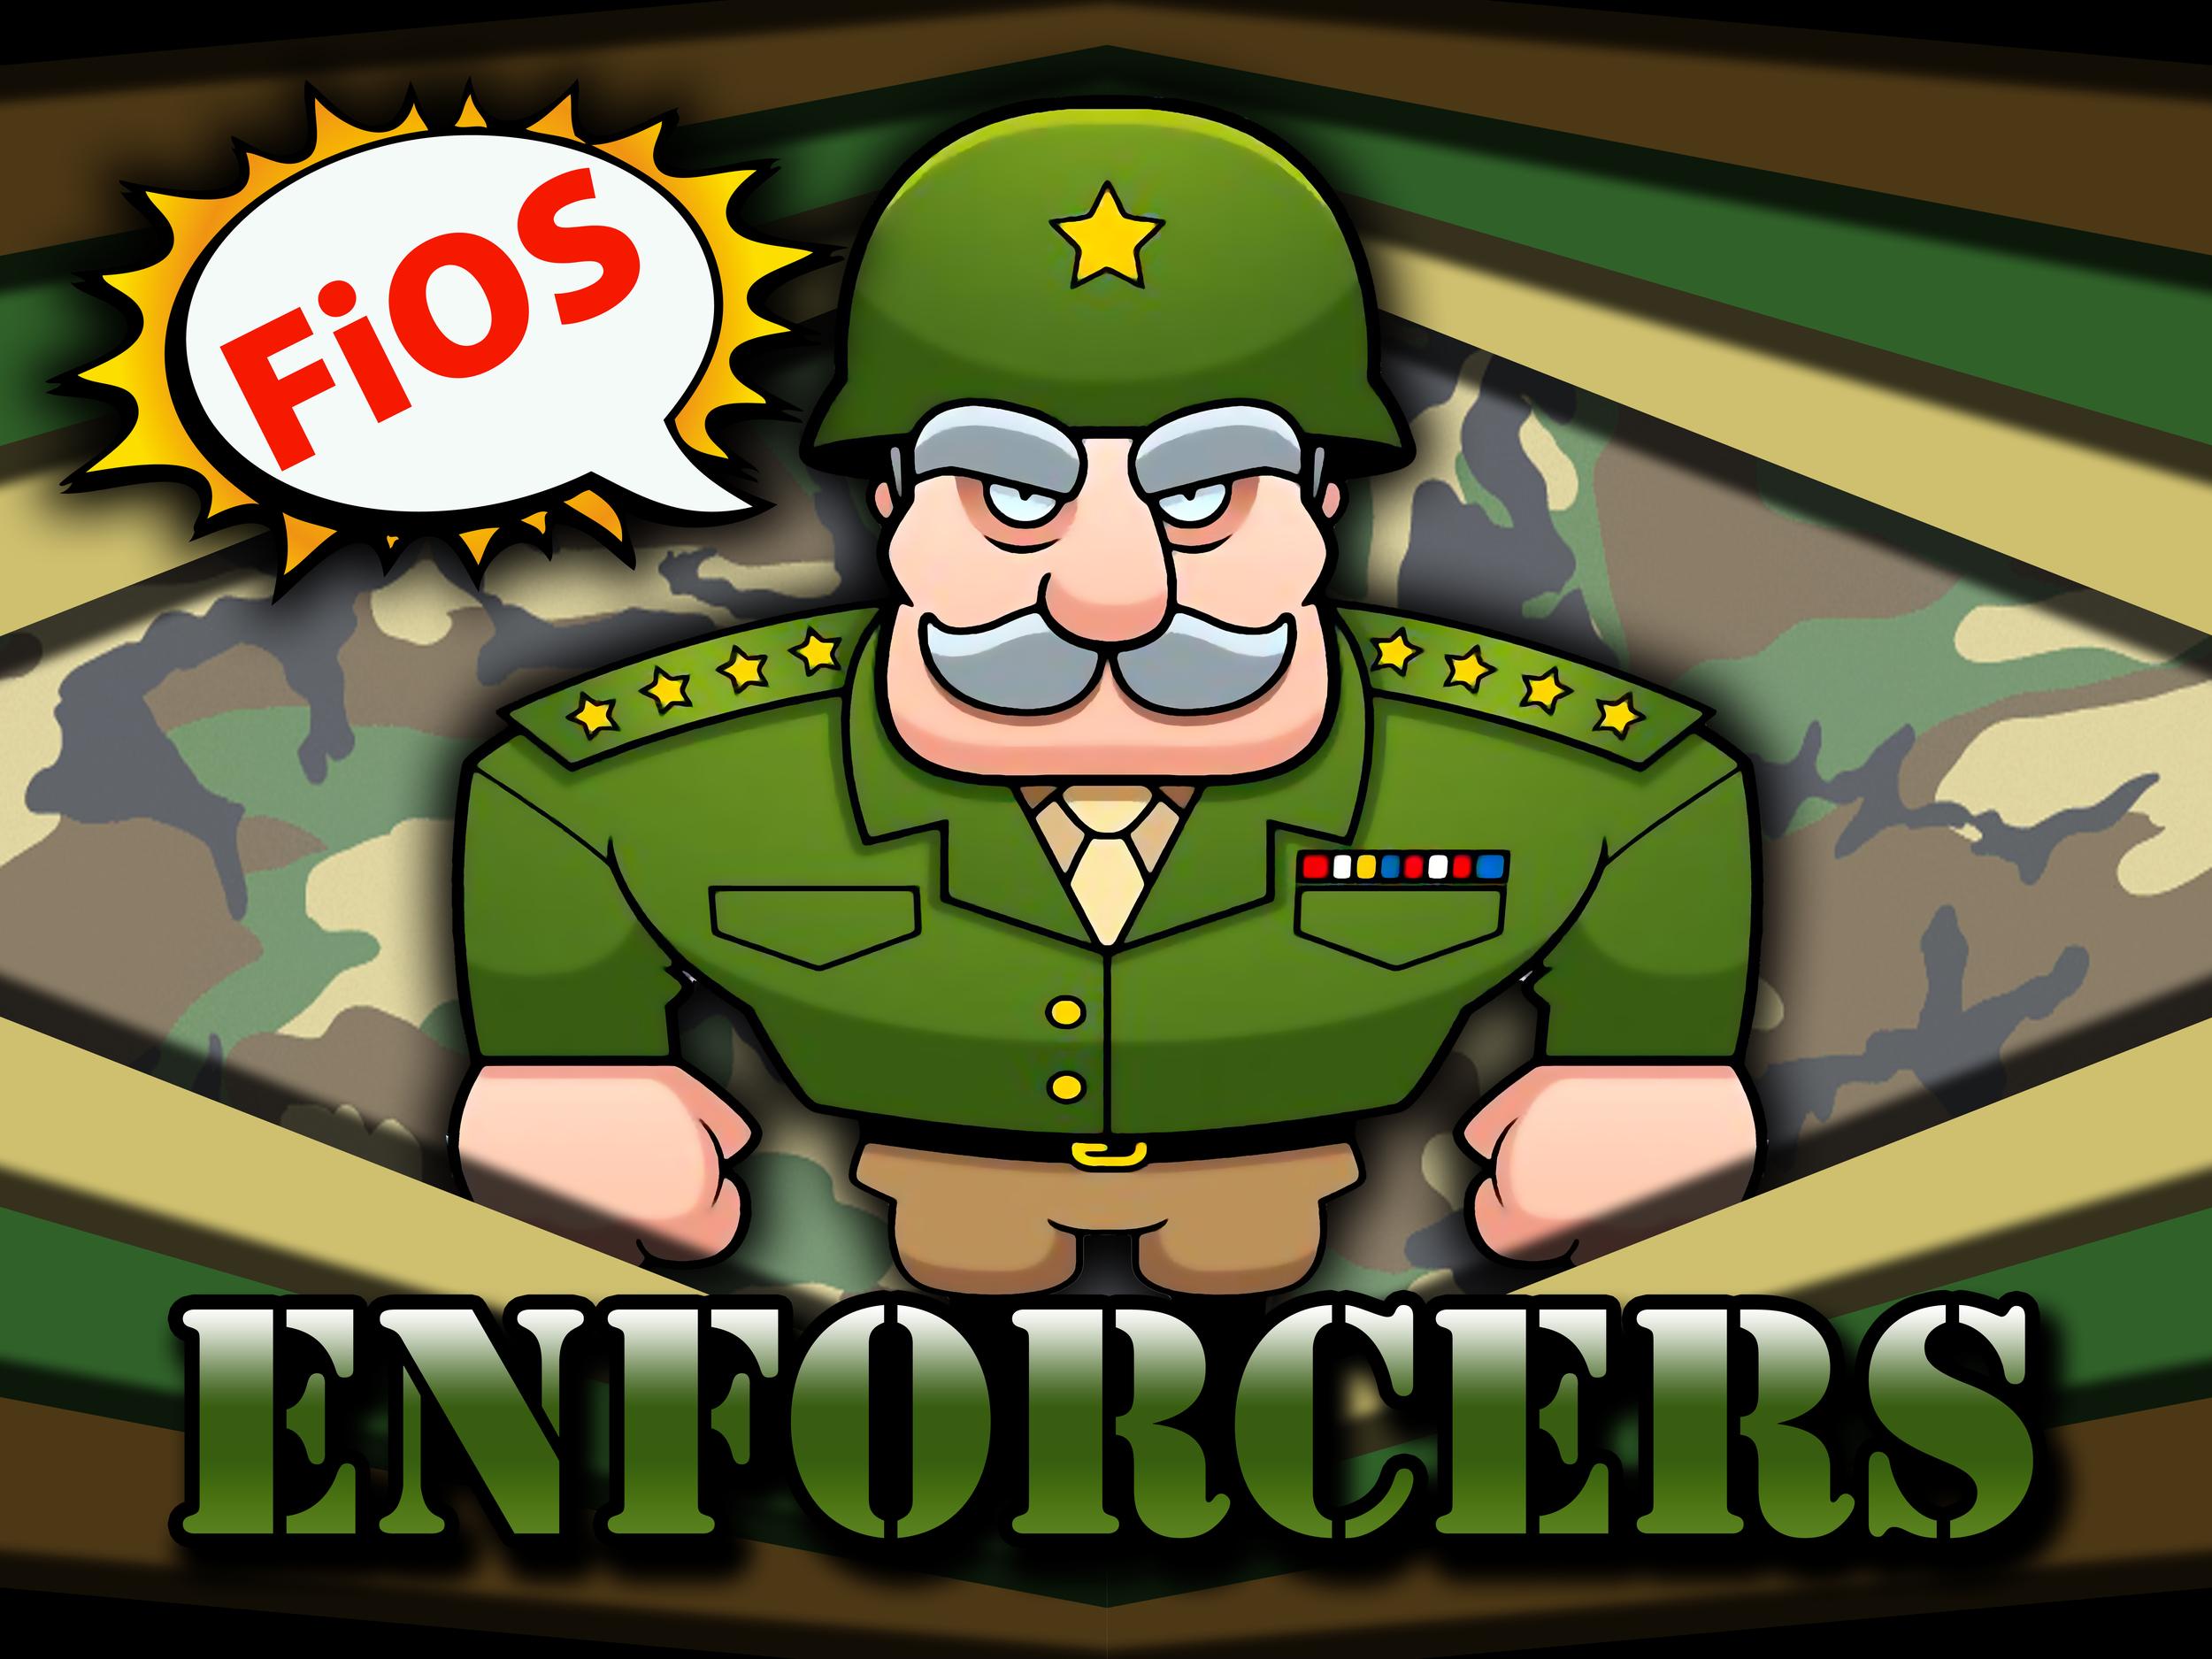 Verizon FiOS Enforcers 3x4 Banner.jpg